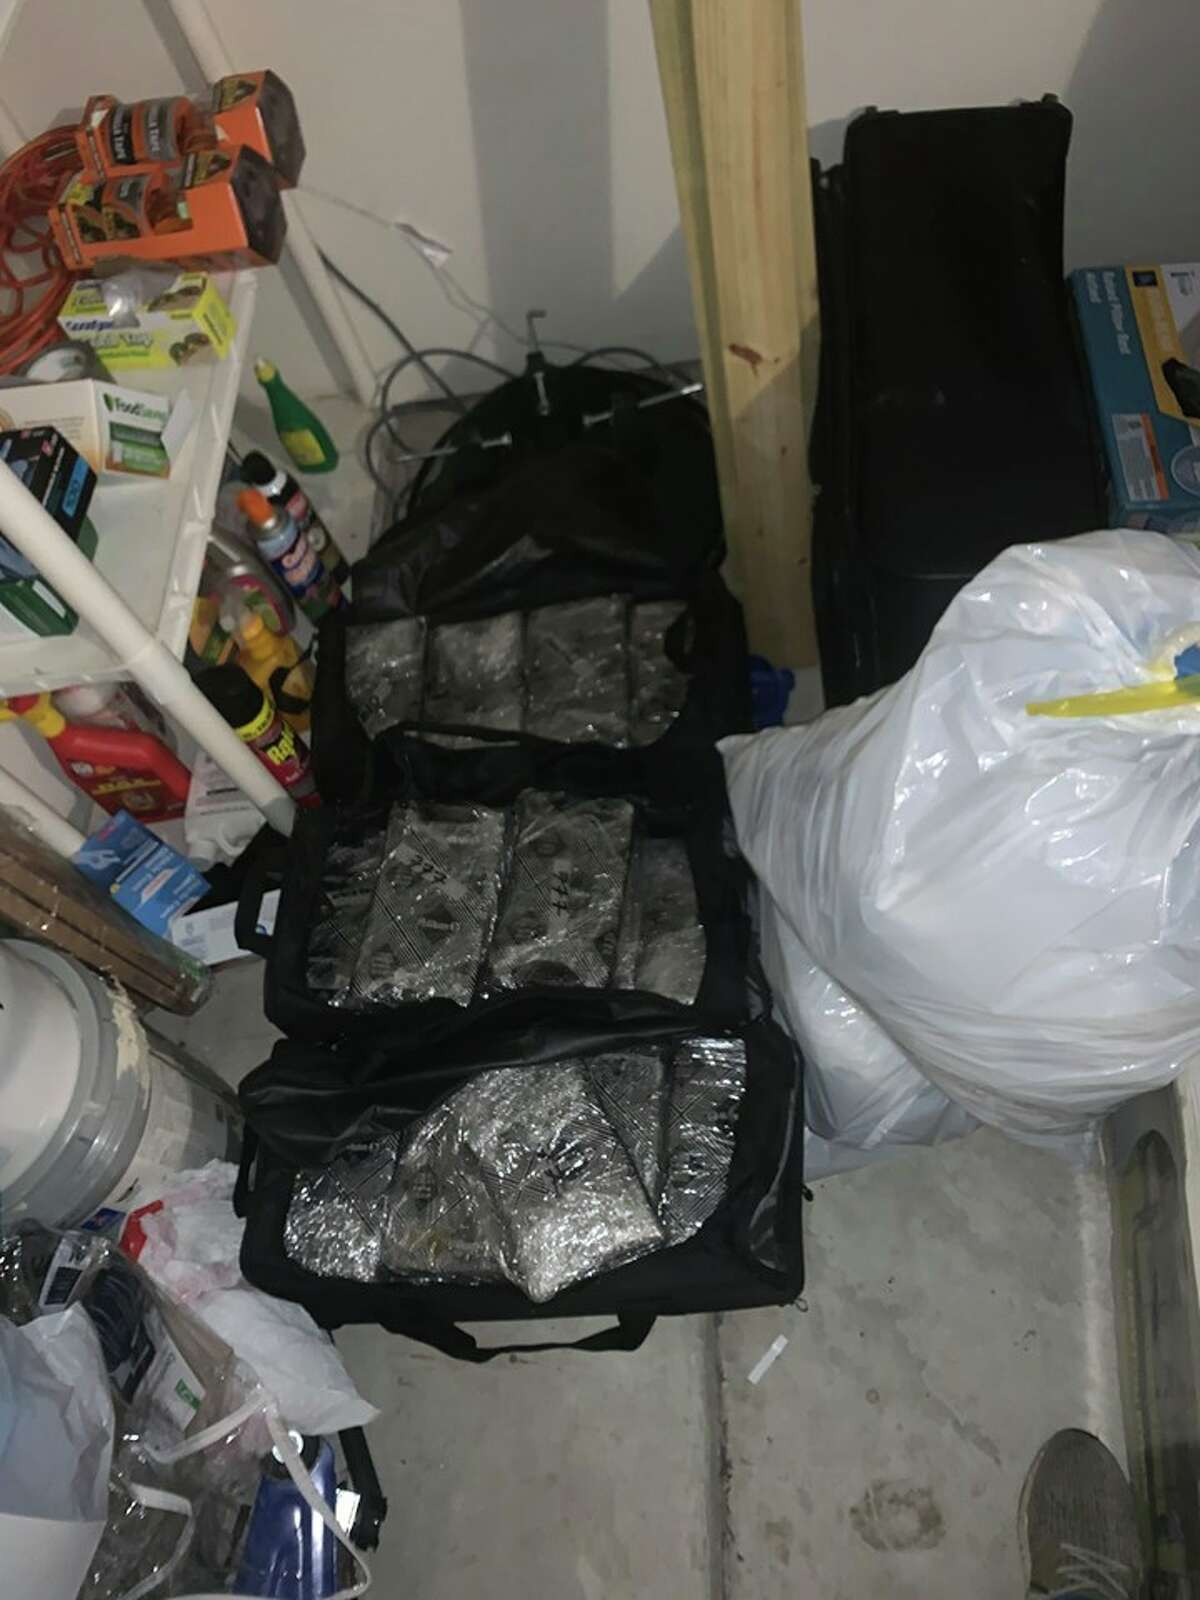 Police found 66 kilos of cocaine, 6 kilos of crystal methamphetamine, 1.1 kilos of fentanyl pills and several guns at the man's home.